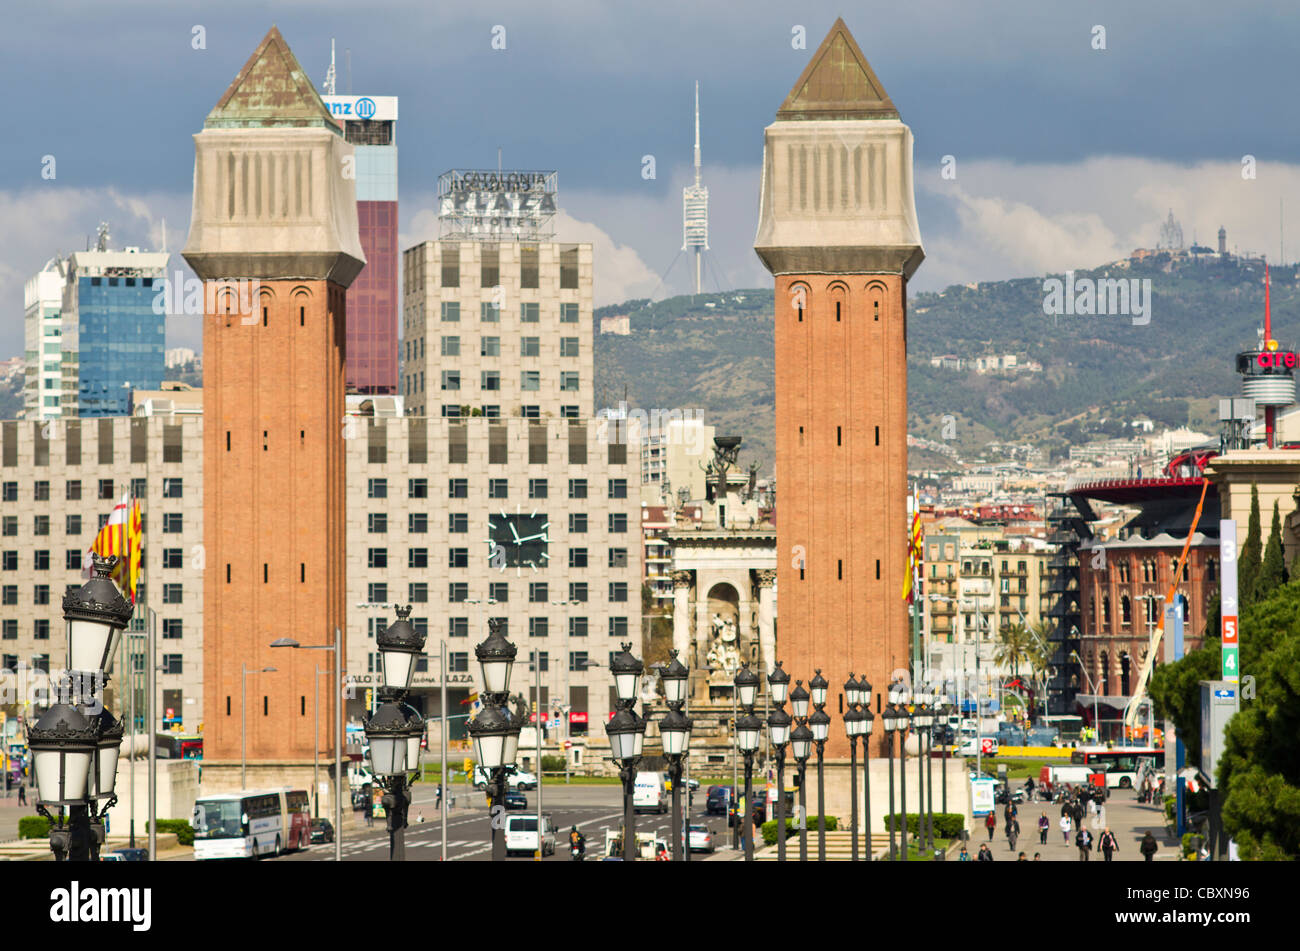 Mont Juic park. Barcelona. Catalonia. Spain - Stock Image